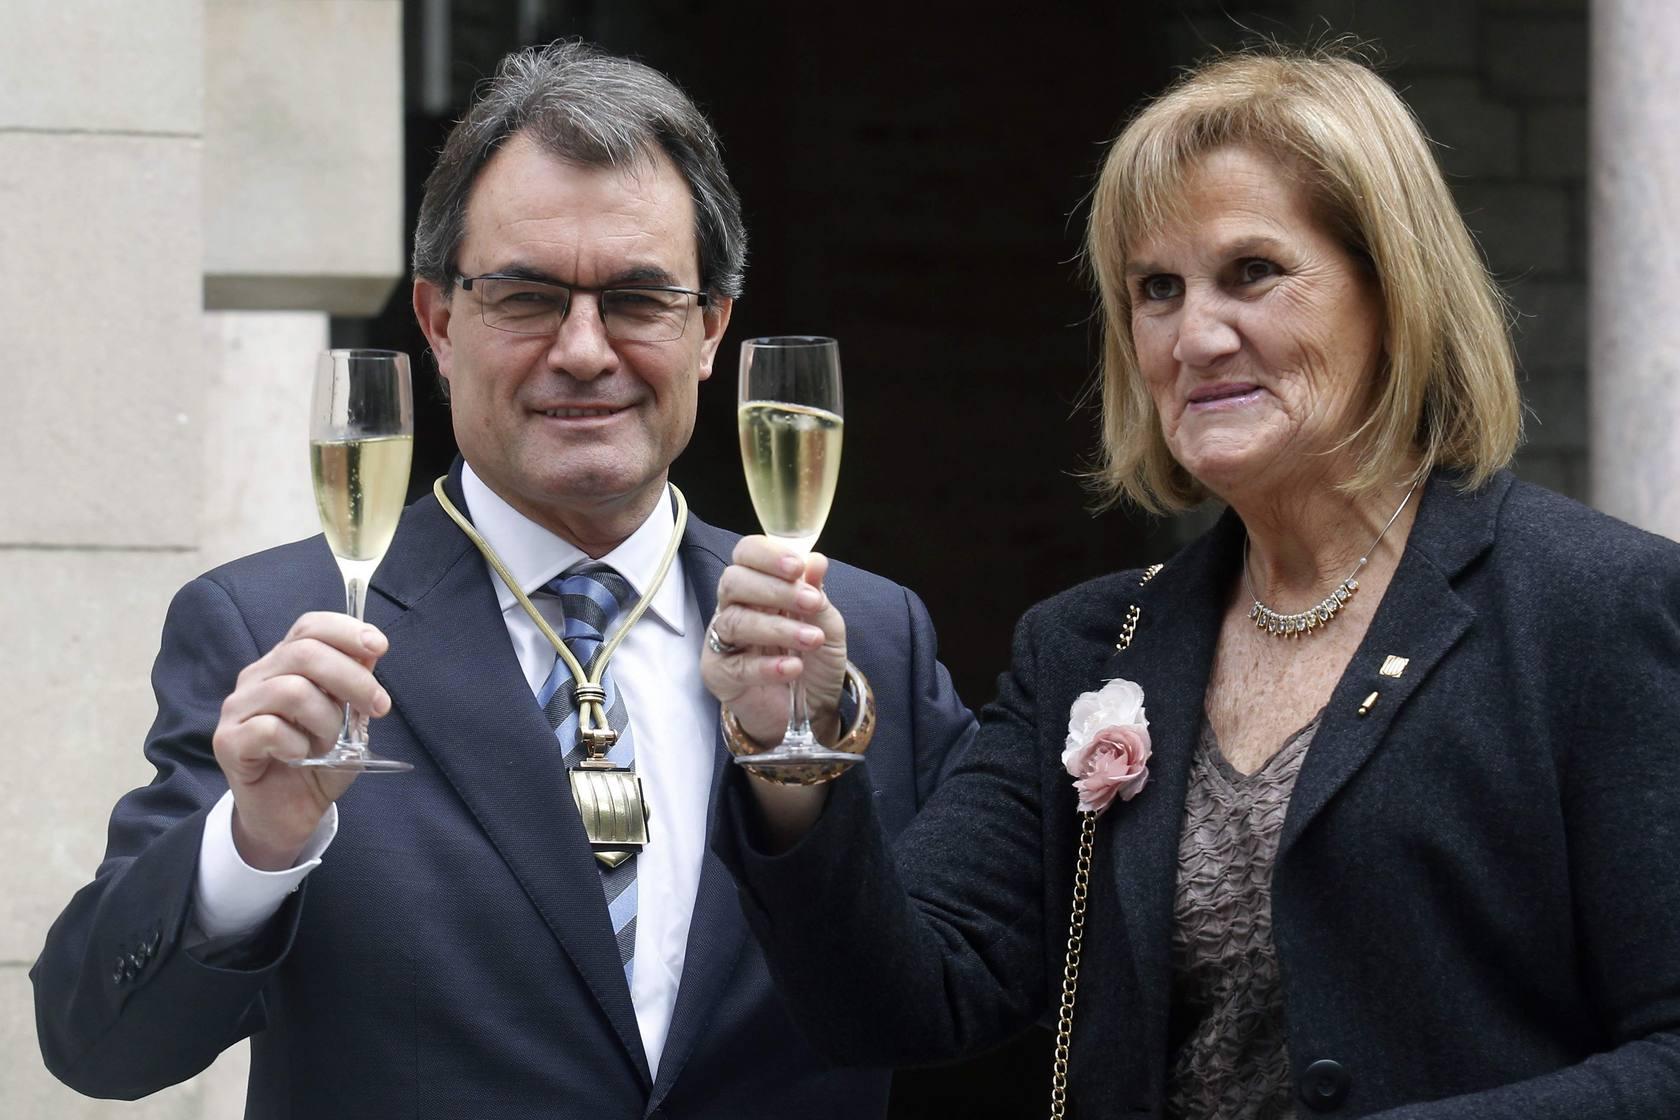 La investidura de Artur Mas